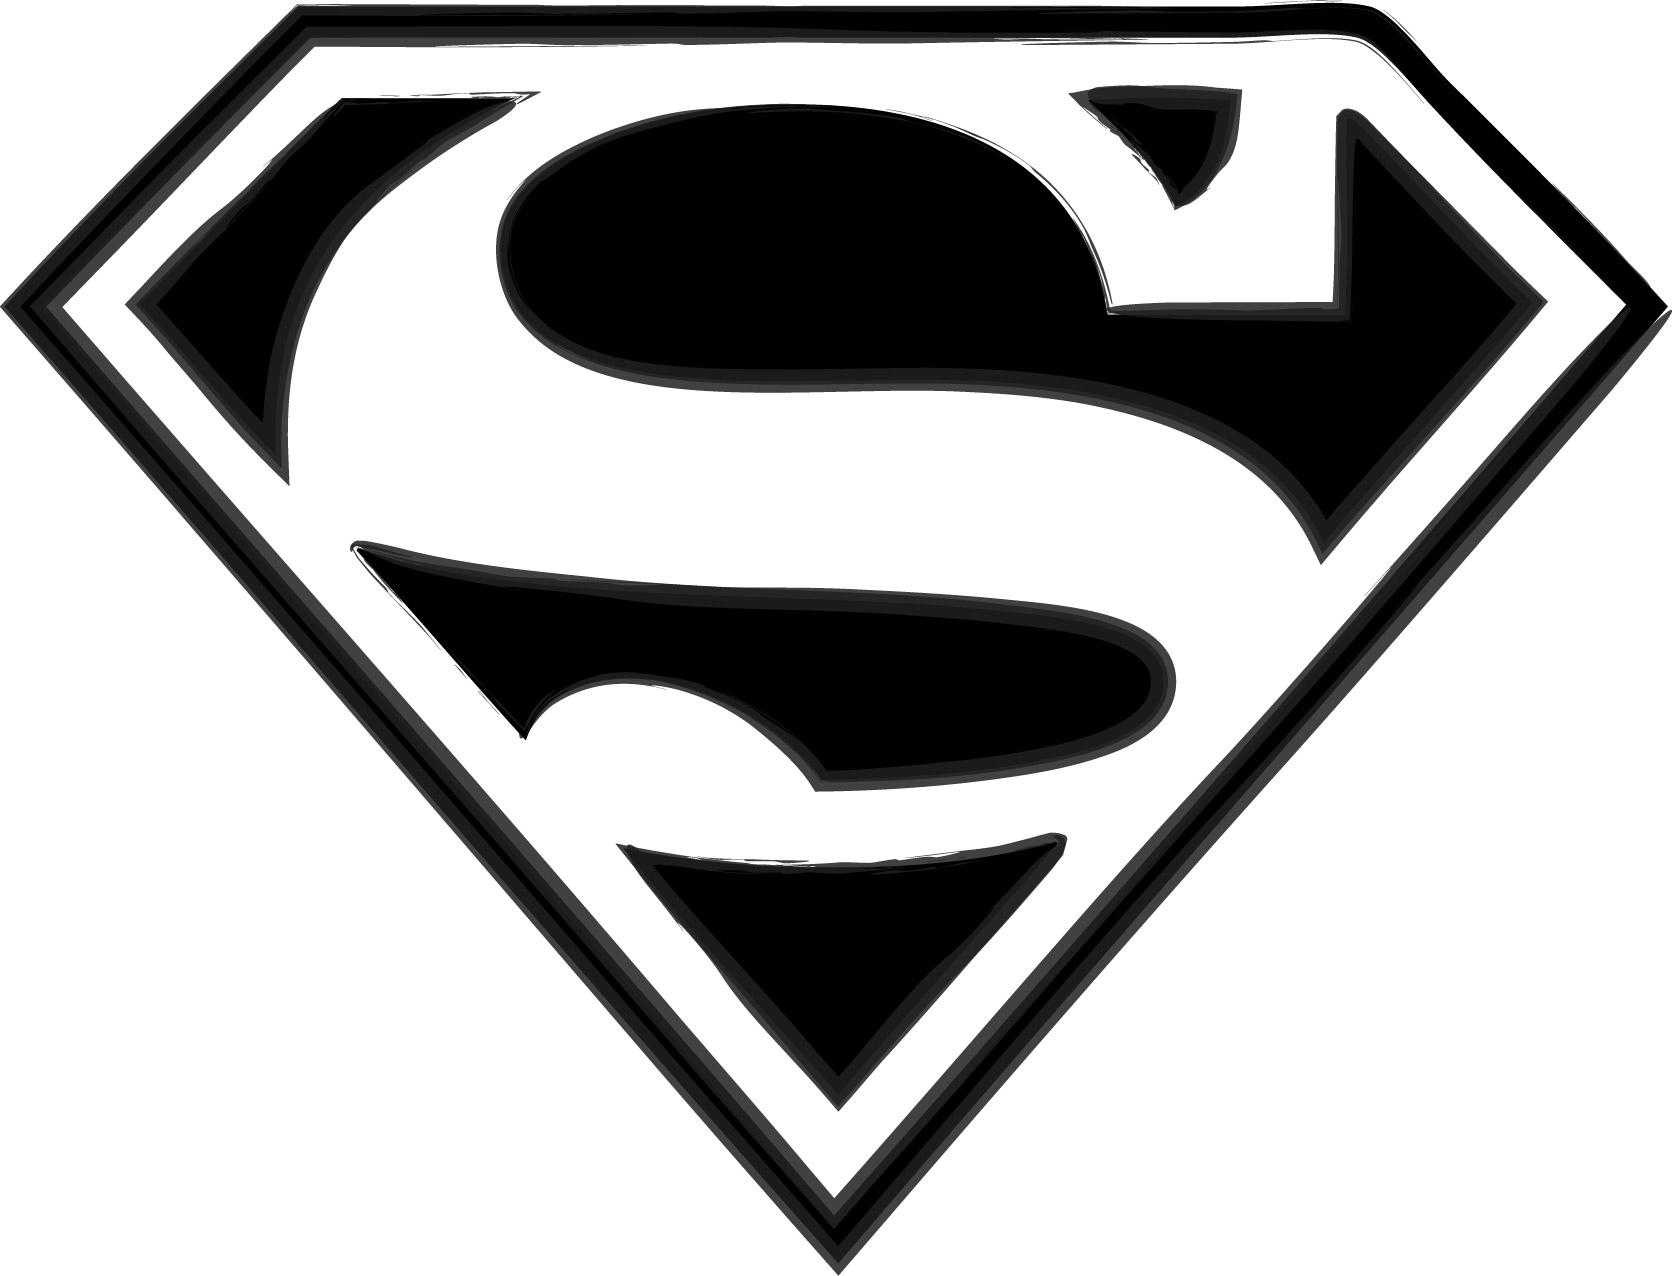 18 outline clipart image transparent Displaying 18> Images For Superwoman Logo Outline - Free Clip Art ... image transparent